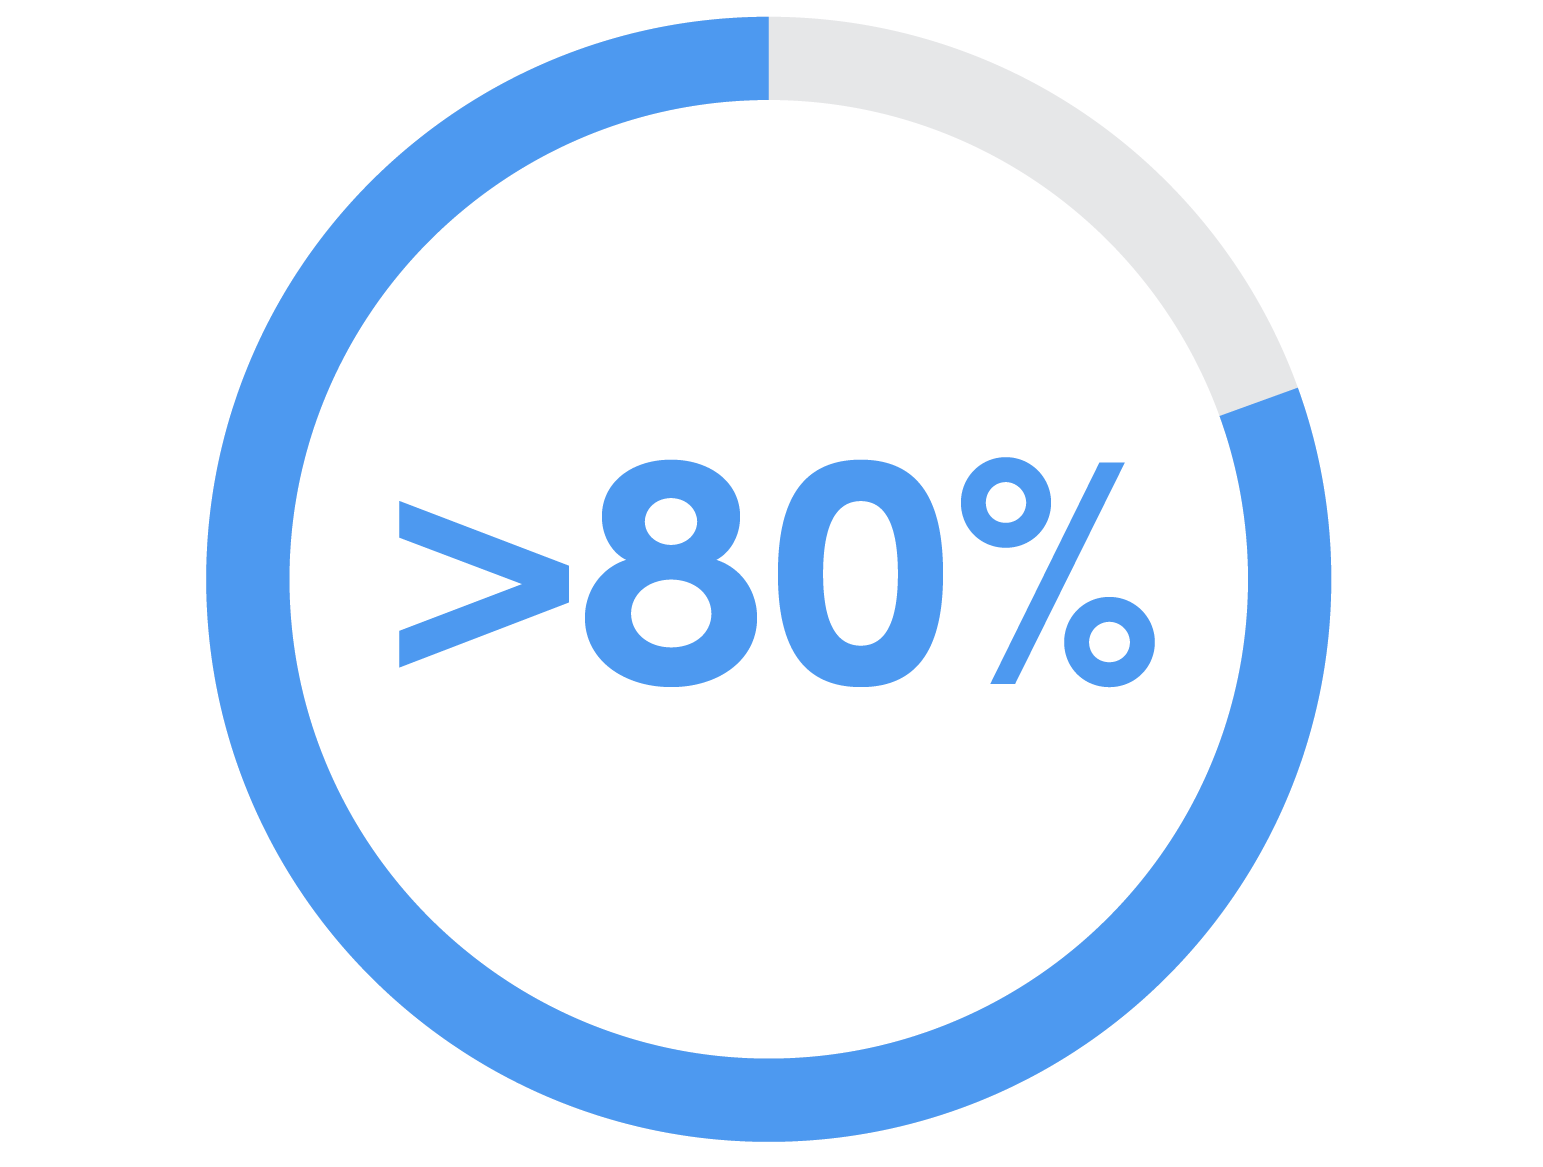 Key Stats__80% #6699ff.png